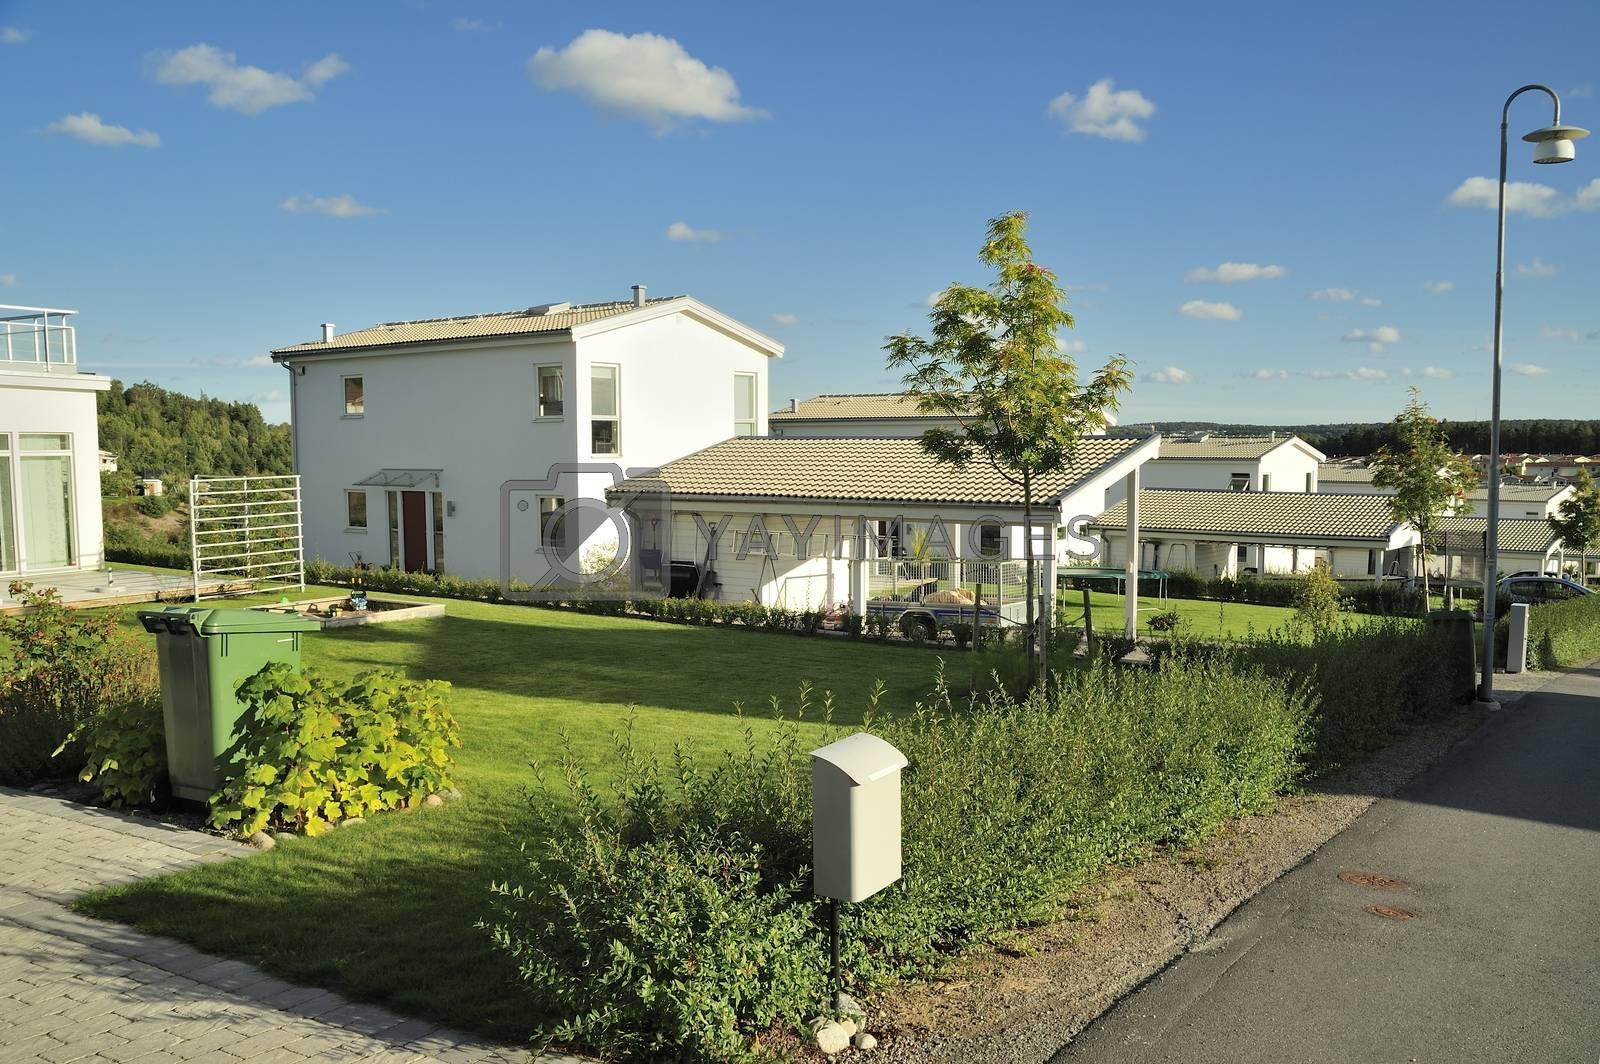 Swedish housing in Ekerö